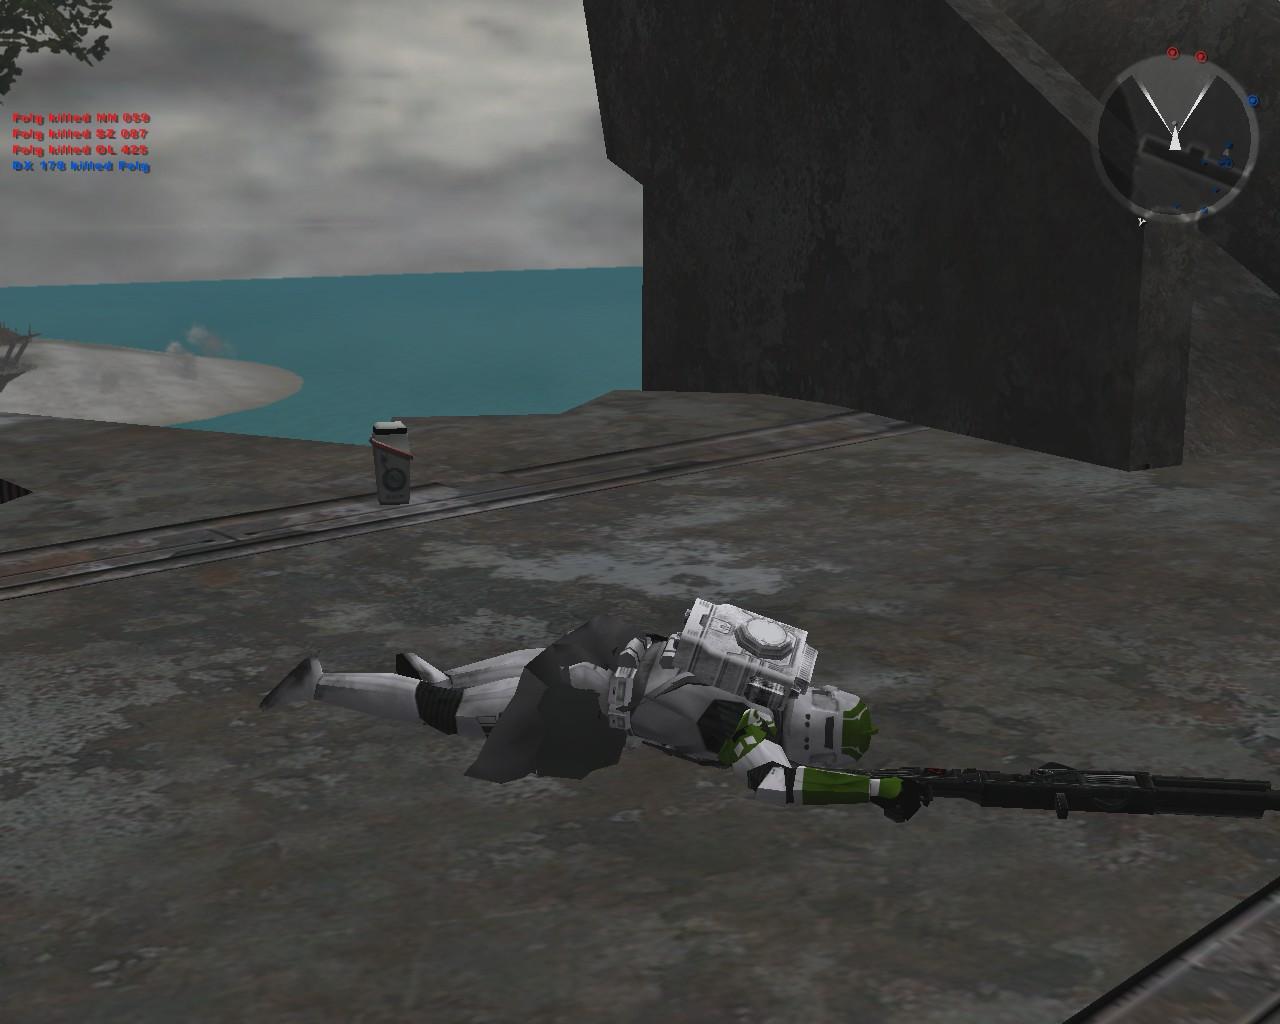 i'm died, lol - Star Wars: Battlefront 2